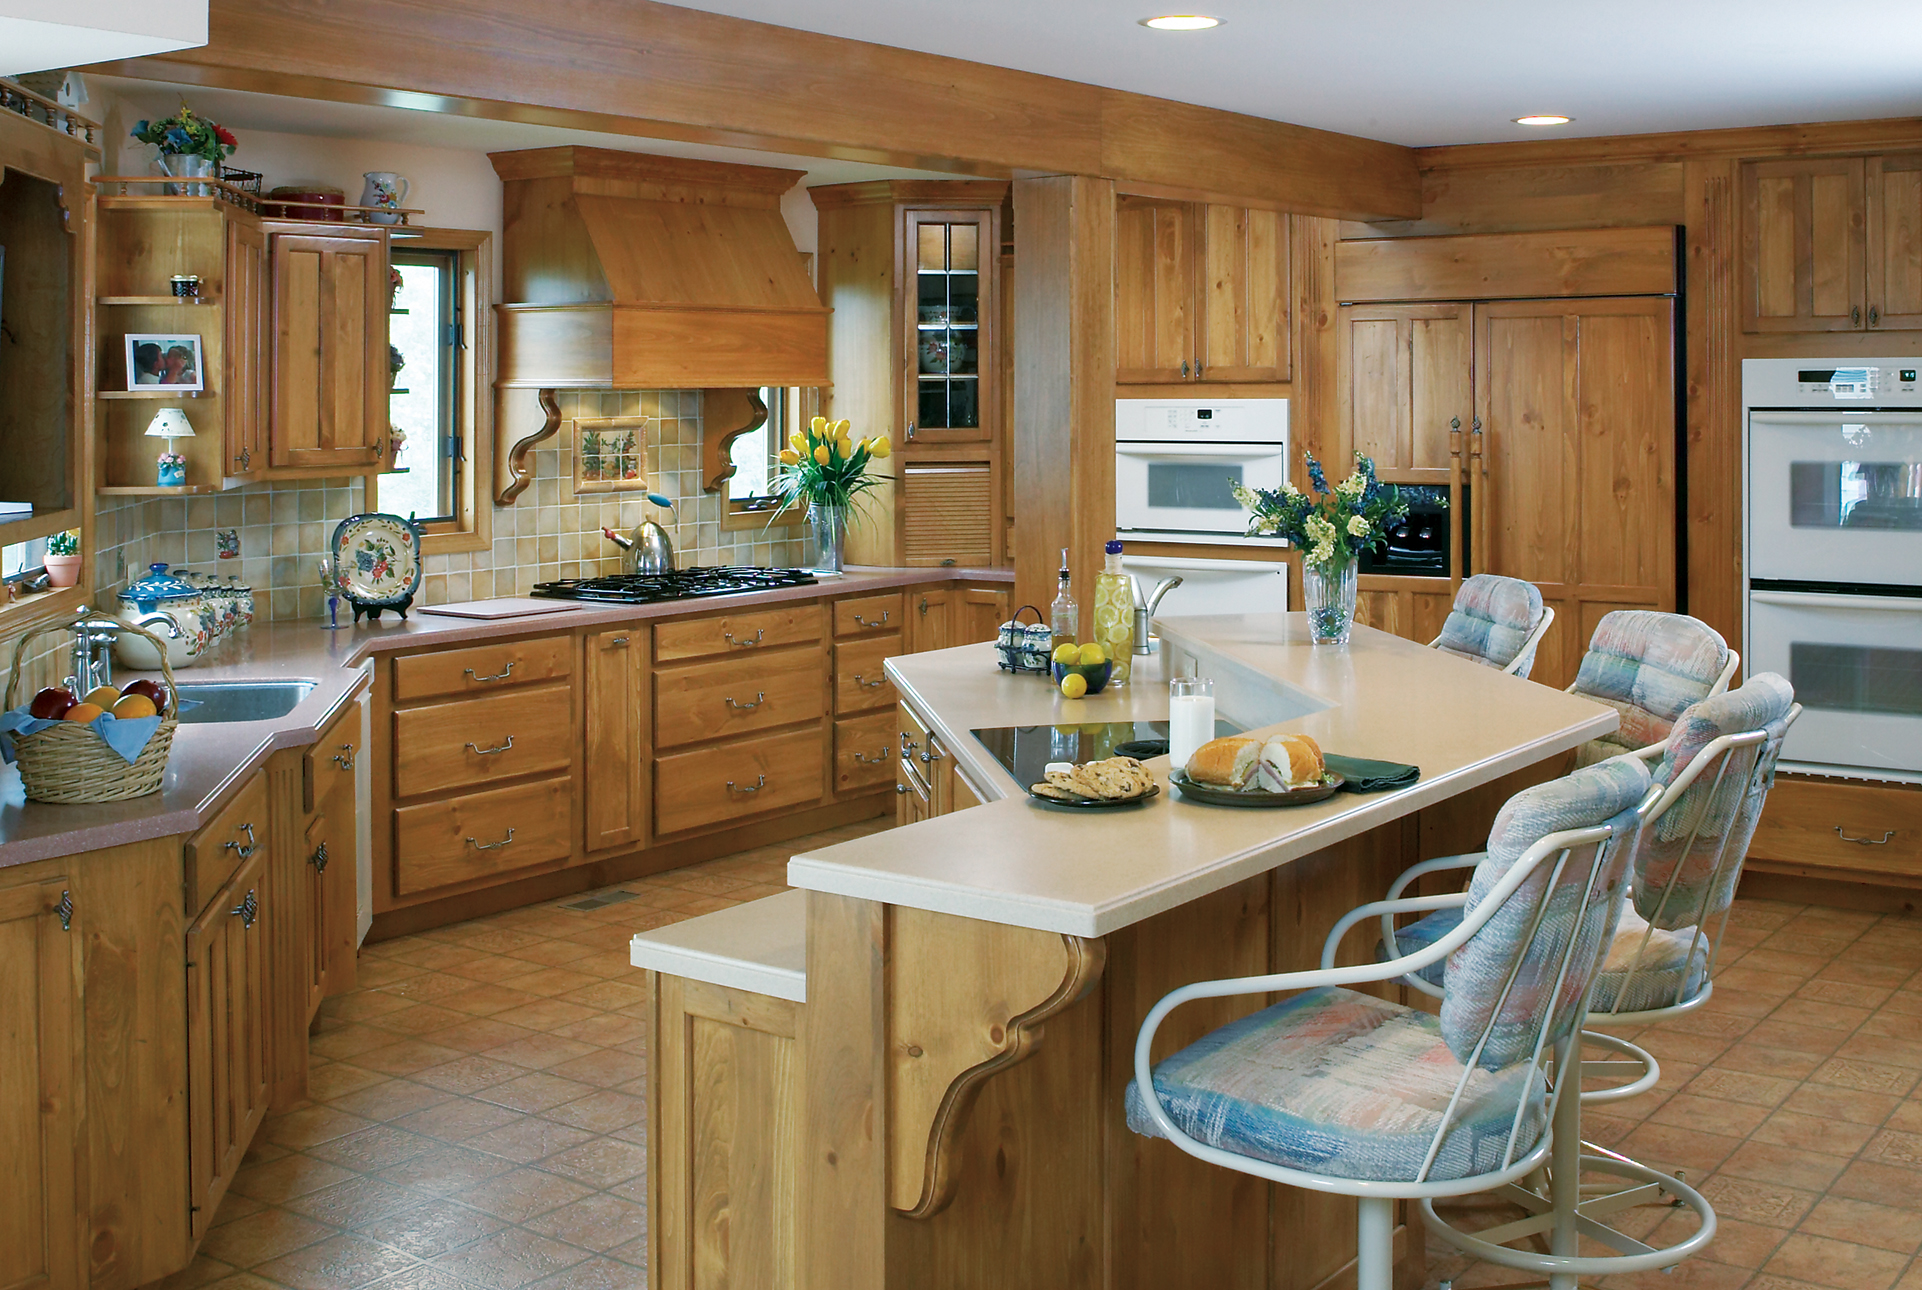 Kitchen bar and stools Photo - 8